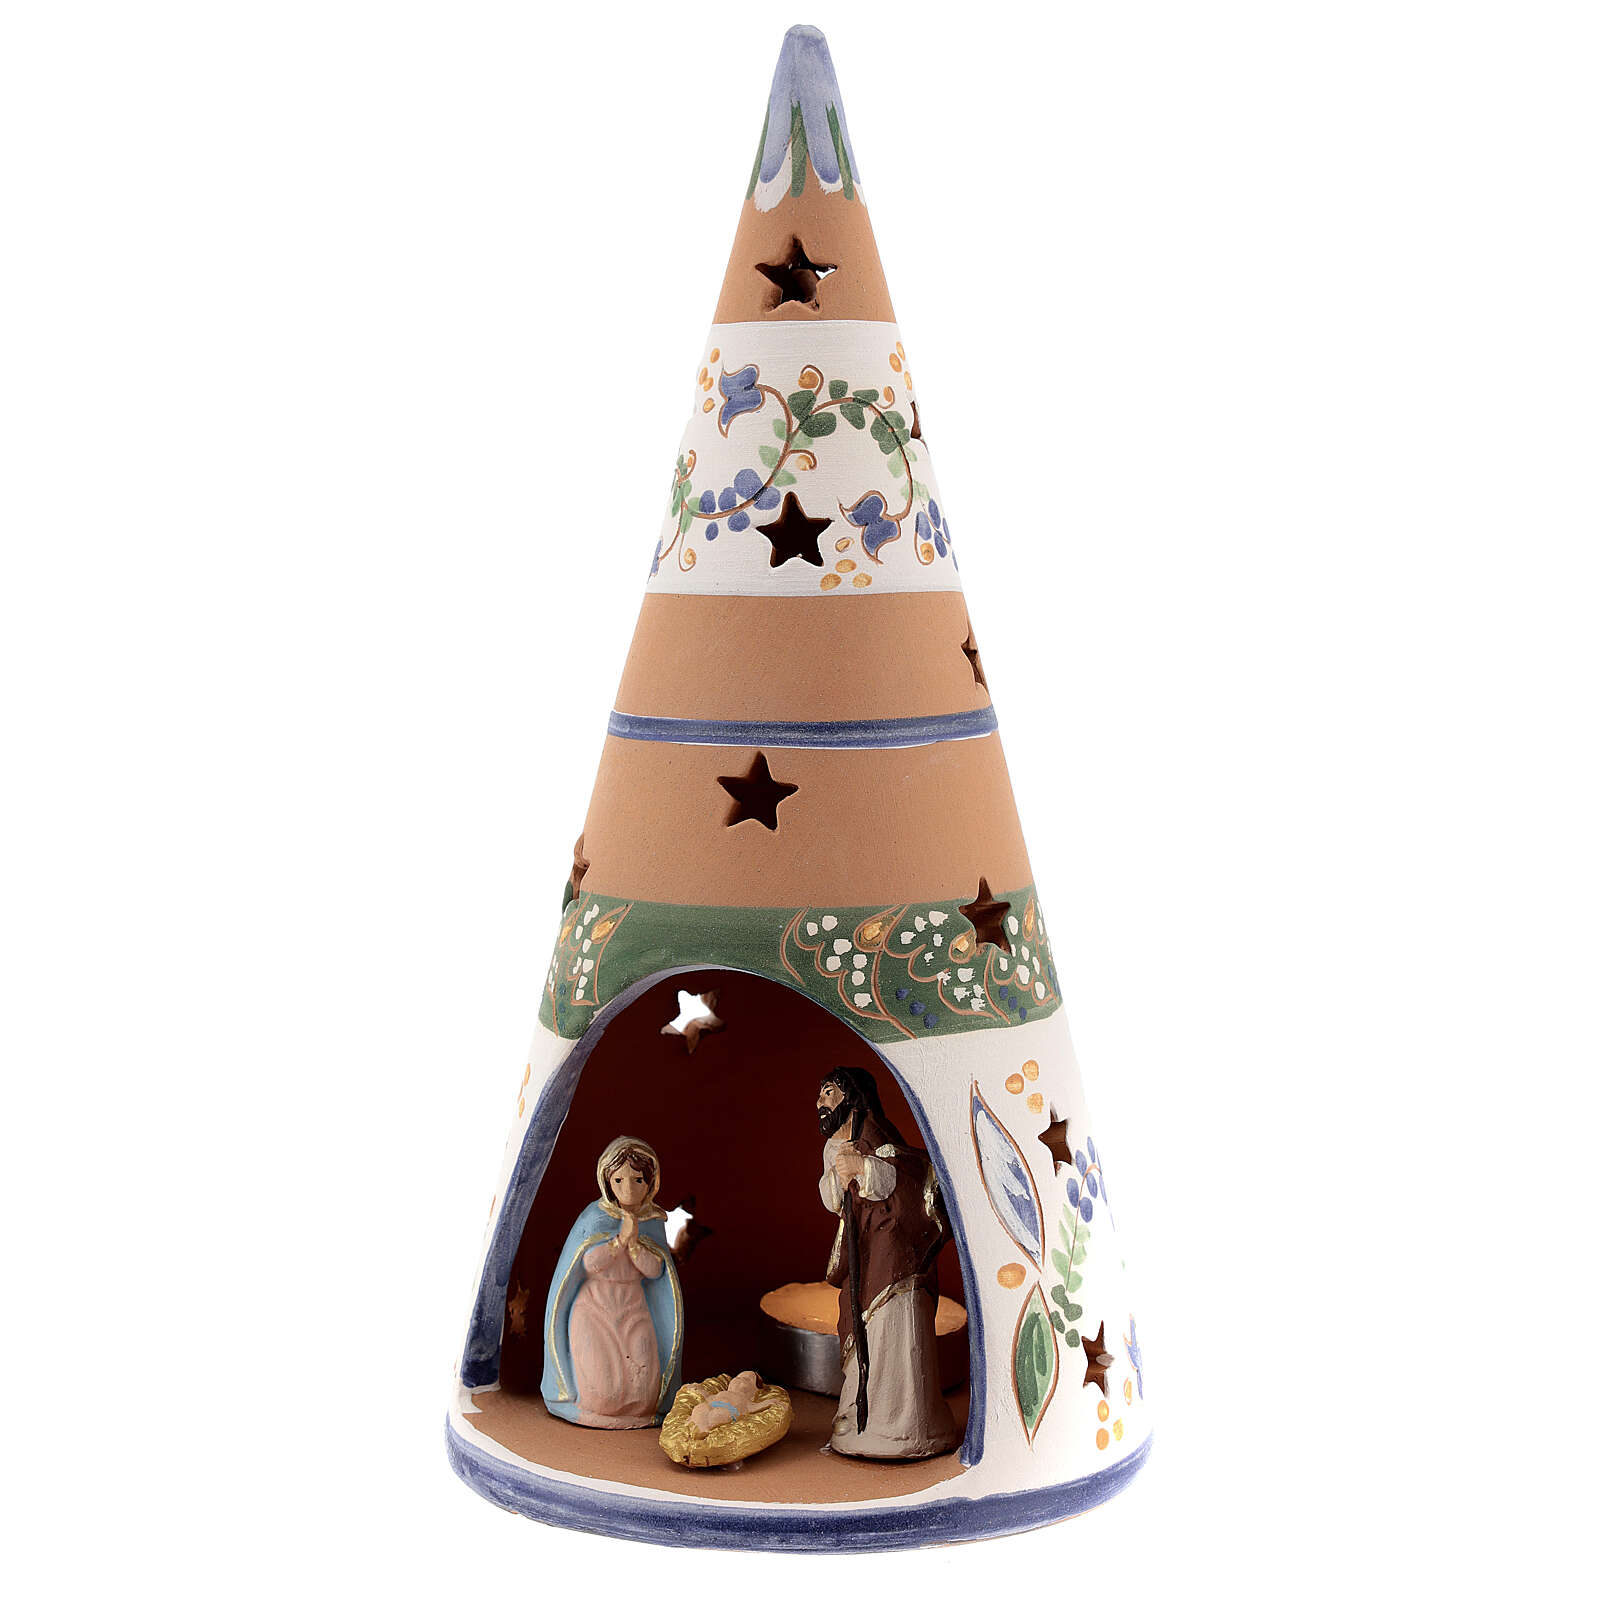 Cone with Nativity set colored Deruta terracotta 25 cm blue 4